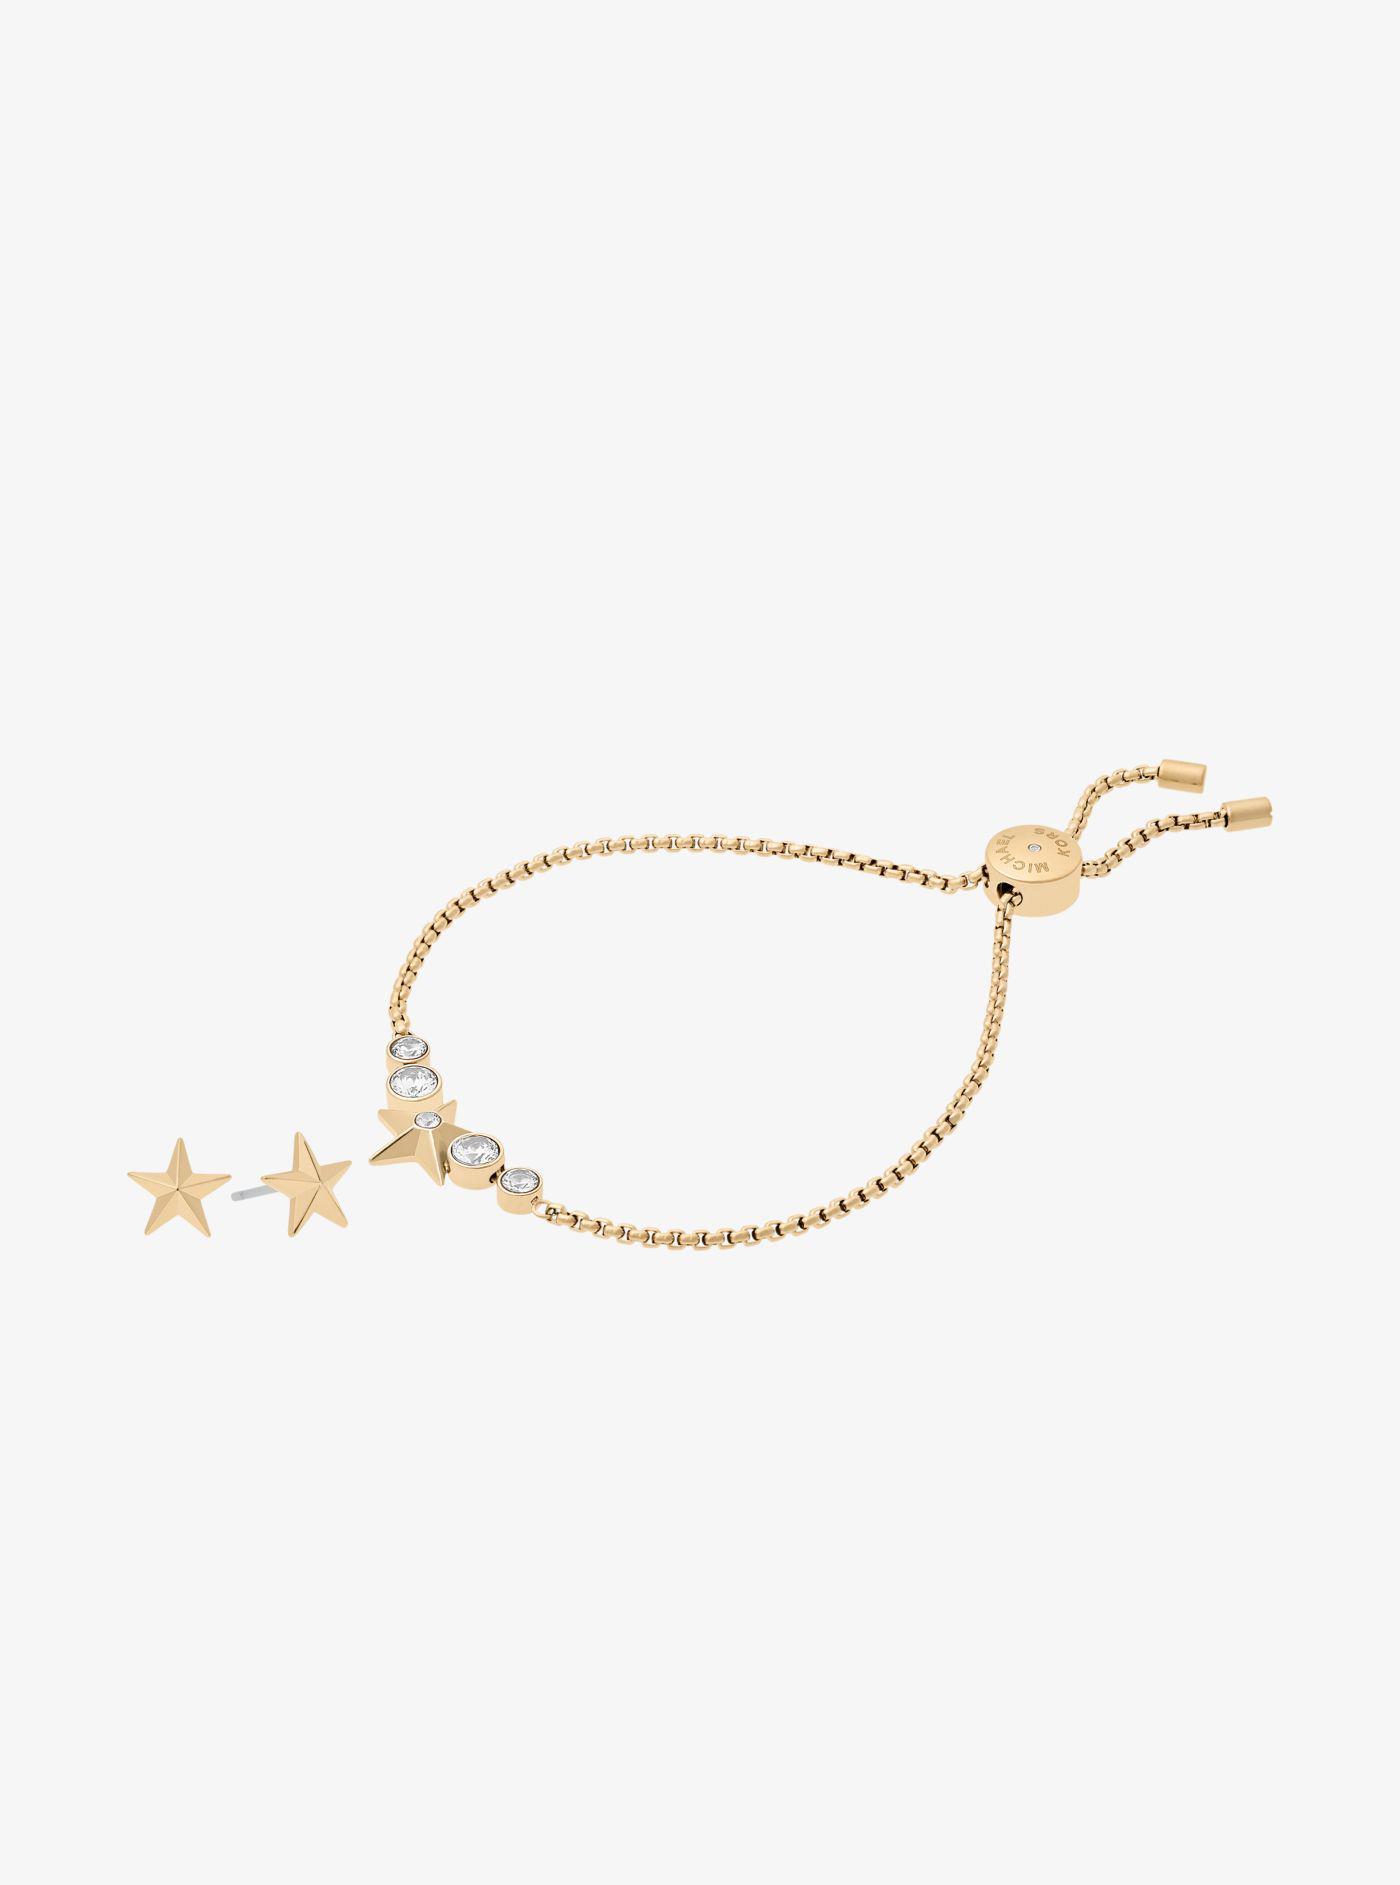 b2a8ff65781f Michael Kors Gold-tone Star Slider Bracelet And Earrings Set in ...